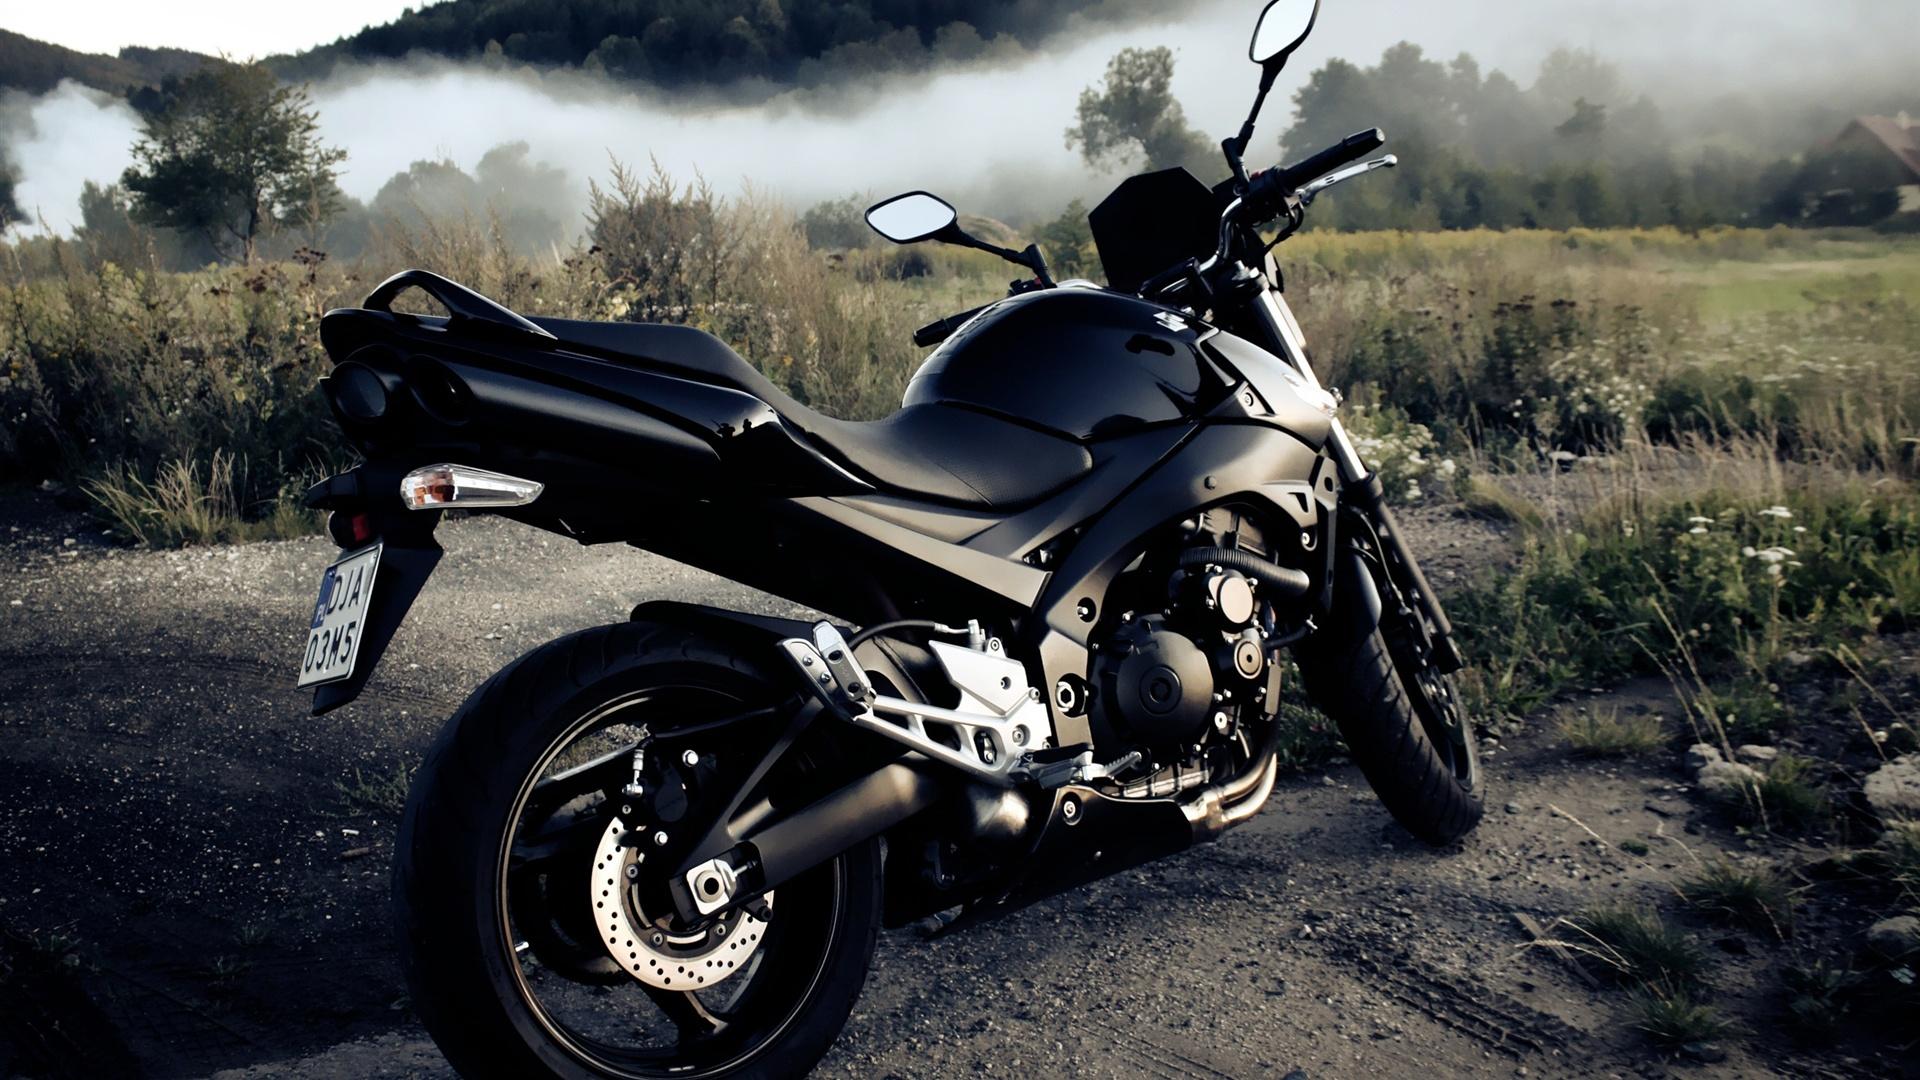 Fonds D'écran Suzuki GSXR 600 Motos 2560x1600 HD Image